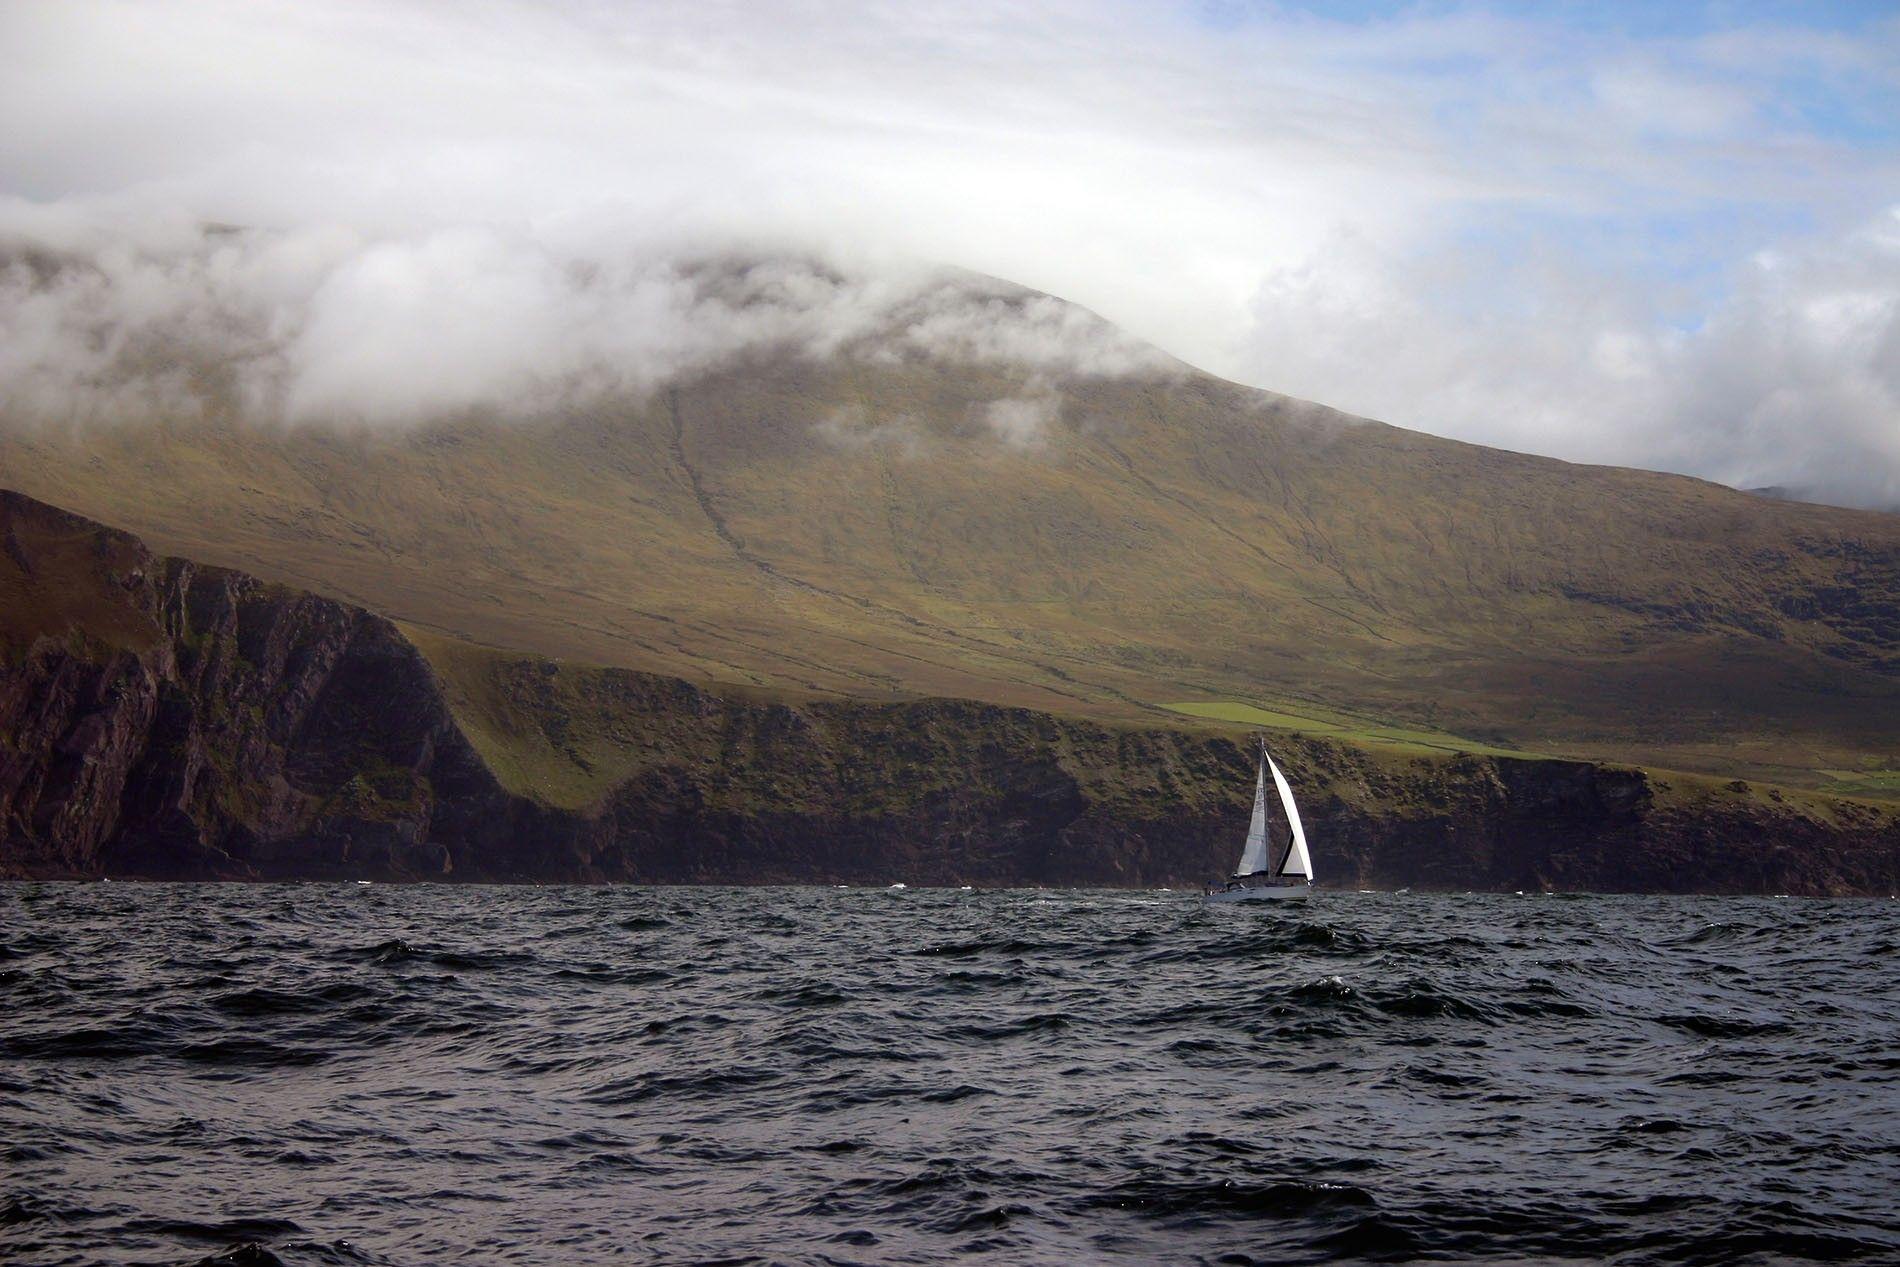 Yacht sailing off Brandon Head, Dingle, Co. Kerry, Ireland